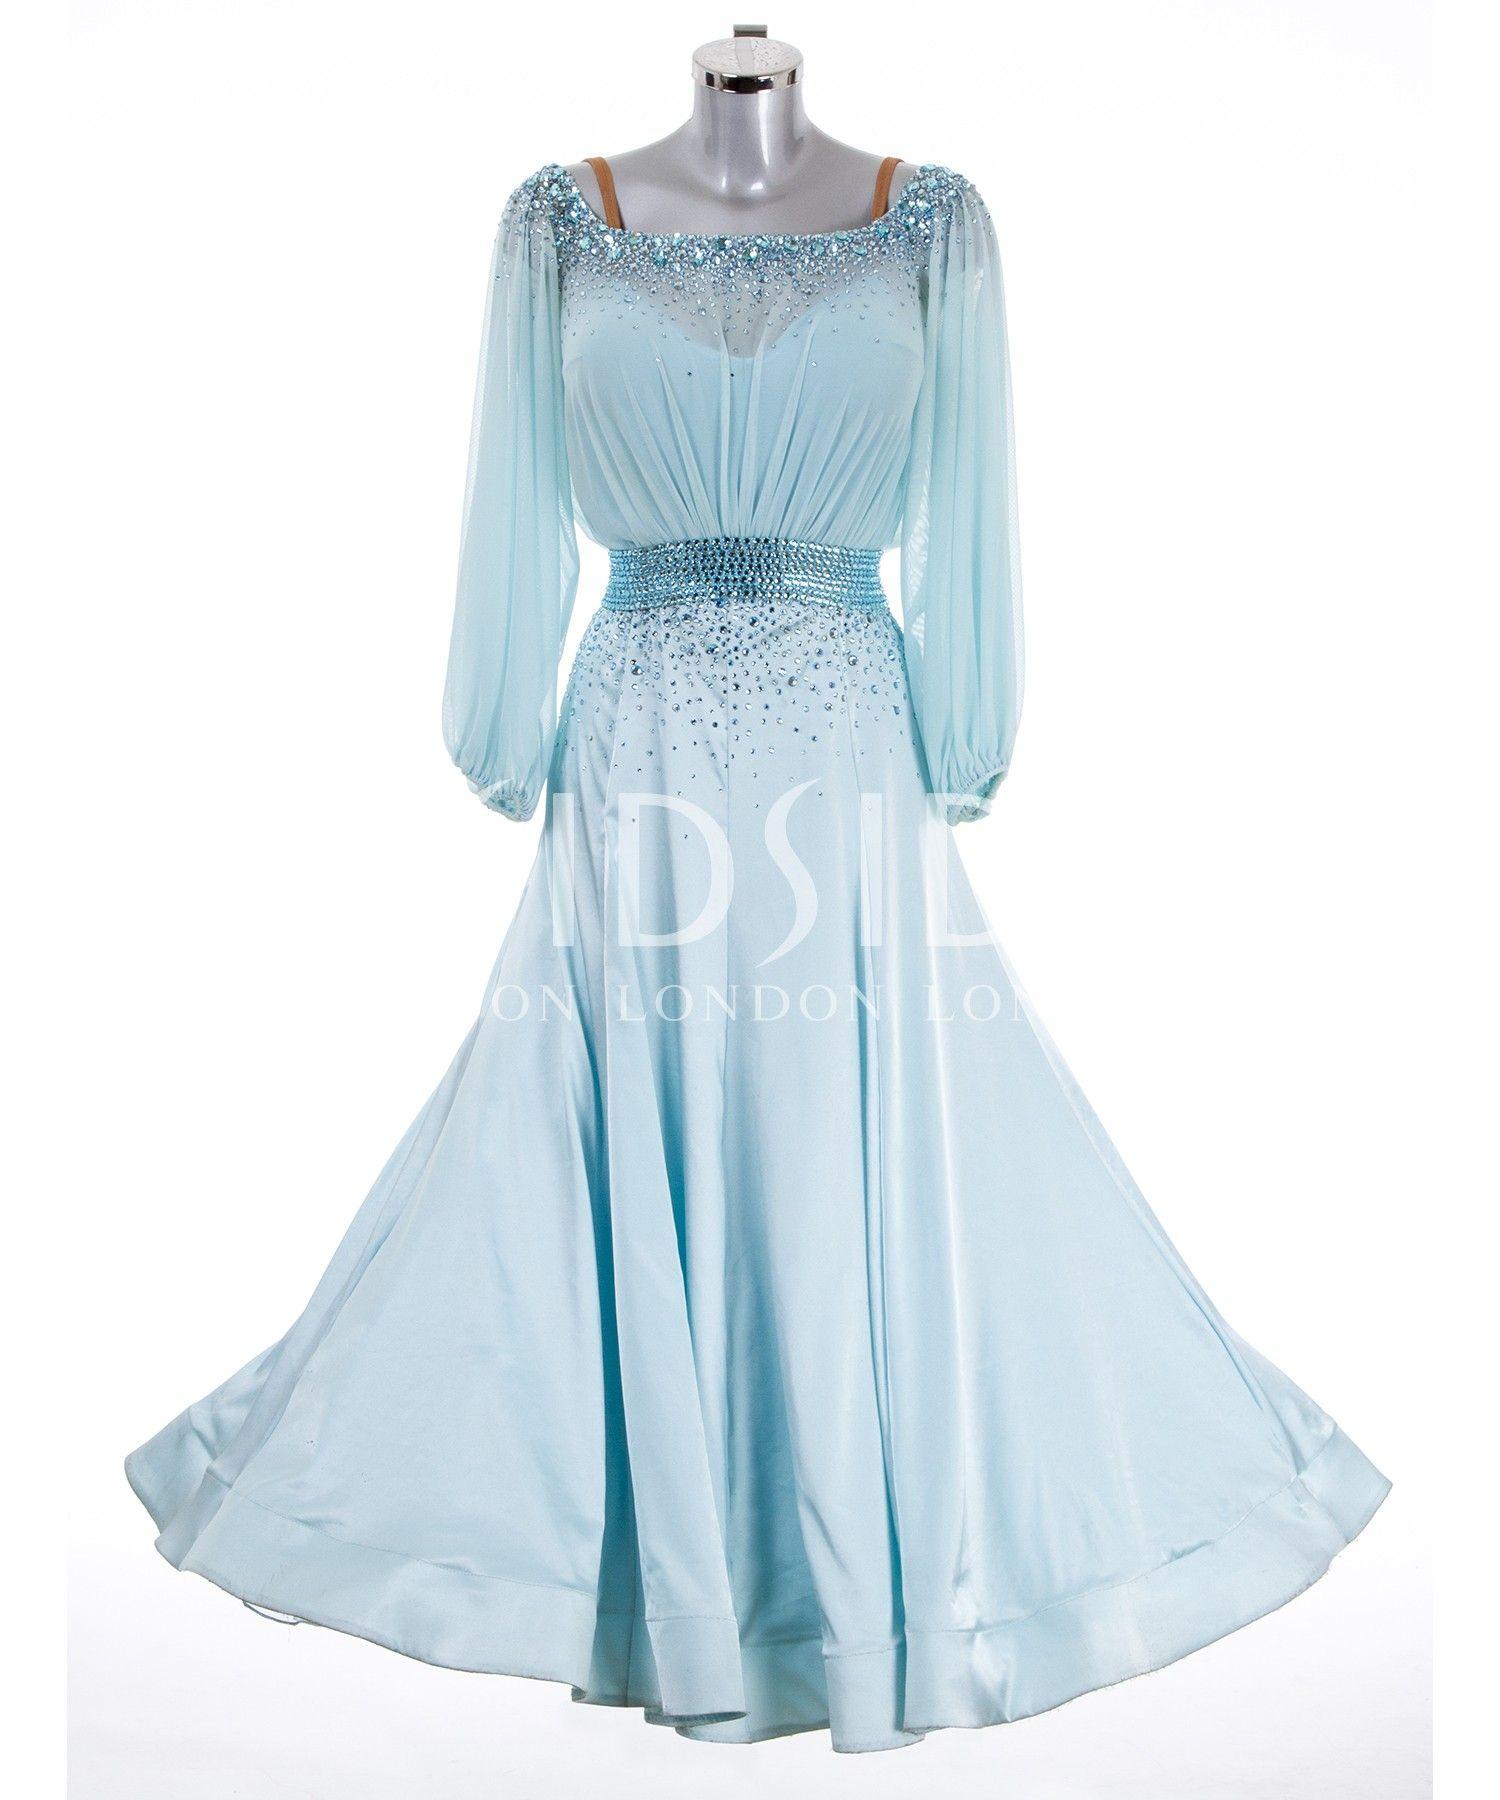 384877 Pale Turquoise Ballroom Dress | Ballroom dresses ...